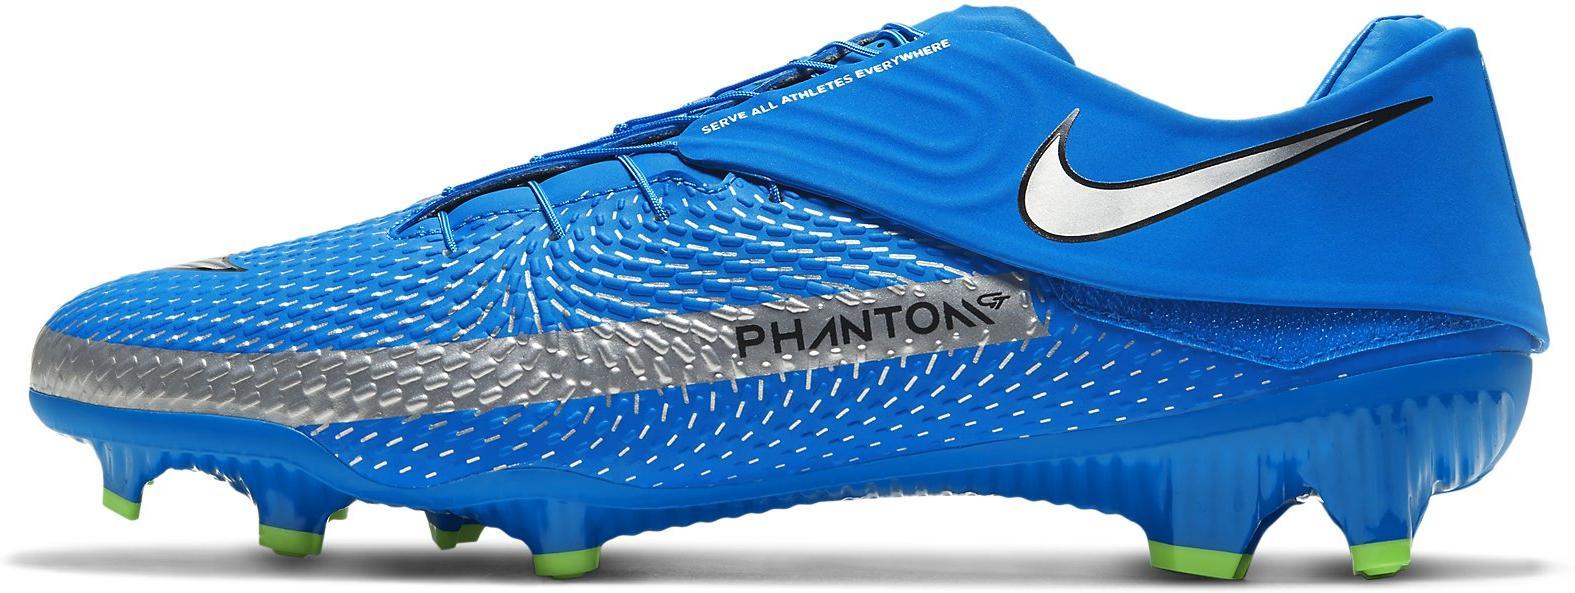 Kopačky Nike PHANTOM GT FLYEASE ACADEMY MG modrá